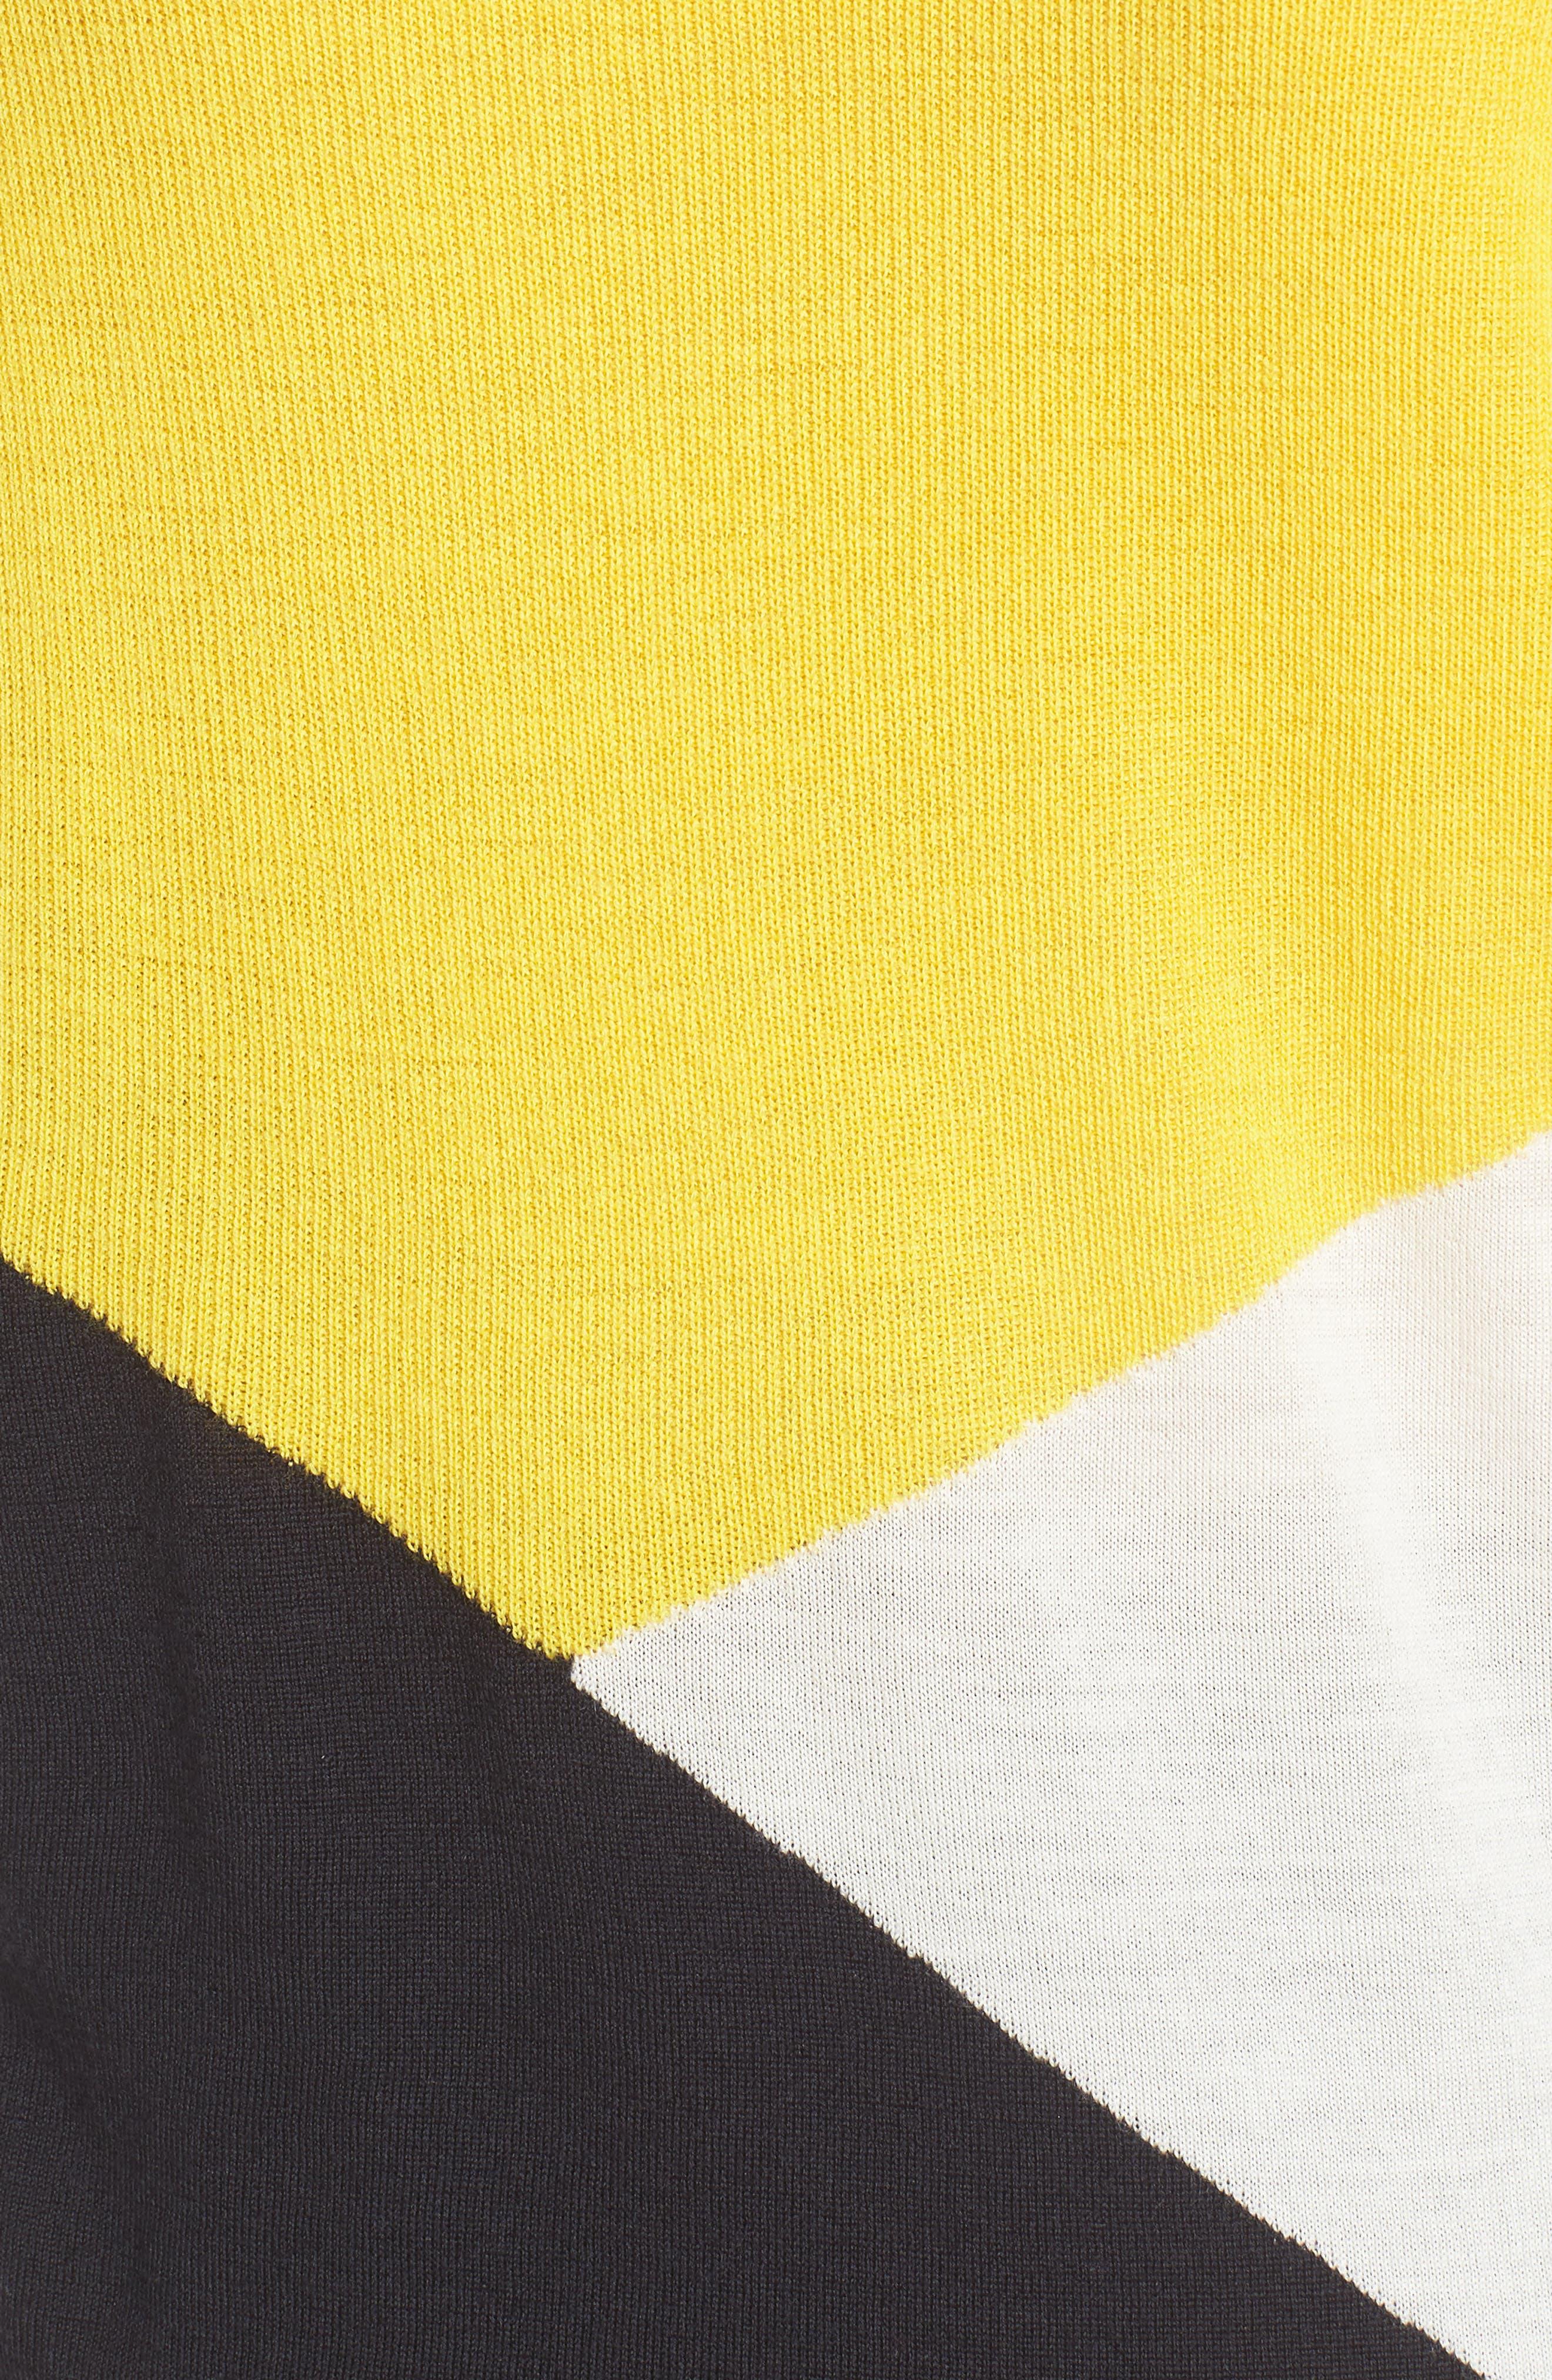 Farrow Colorblock Wool Sweater,                             Alternate thumbnail 5, color,                             Sun Yellow Fantasy